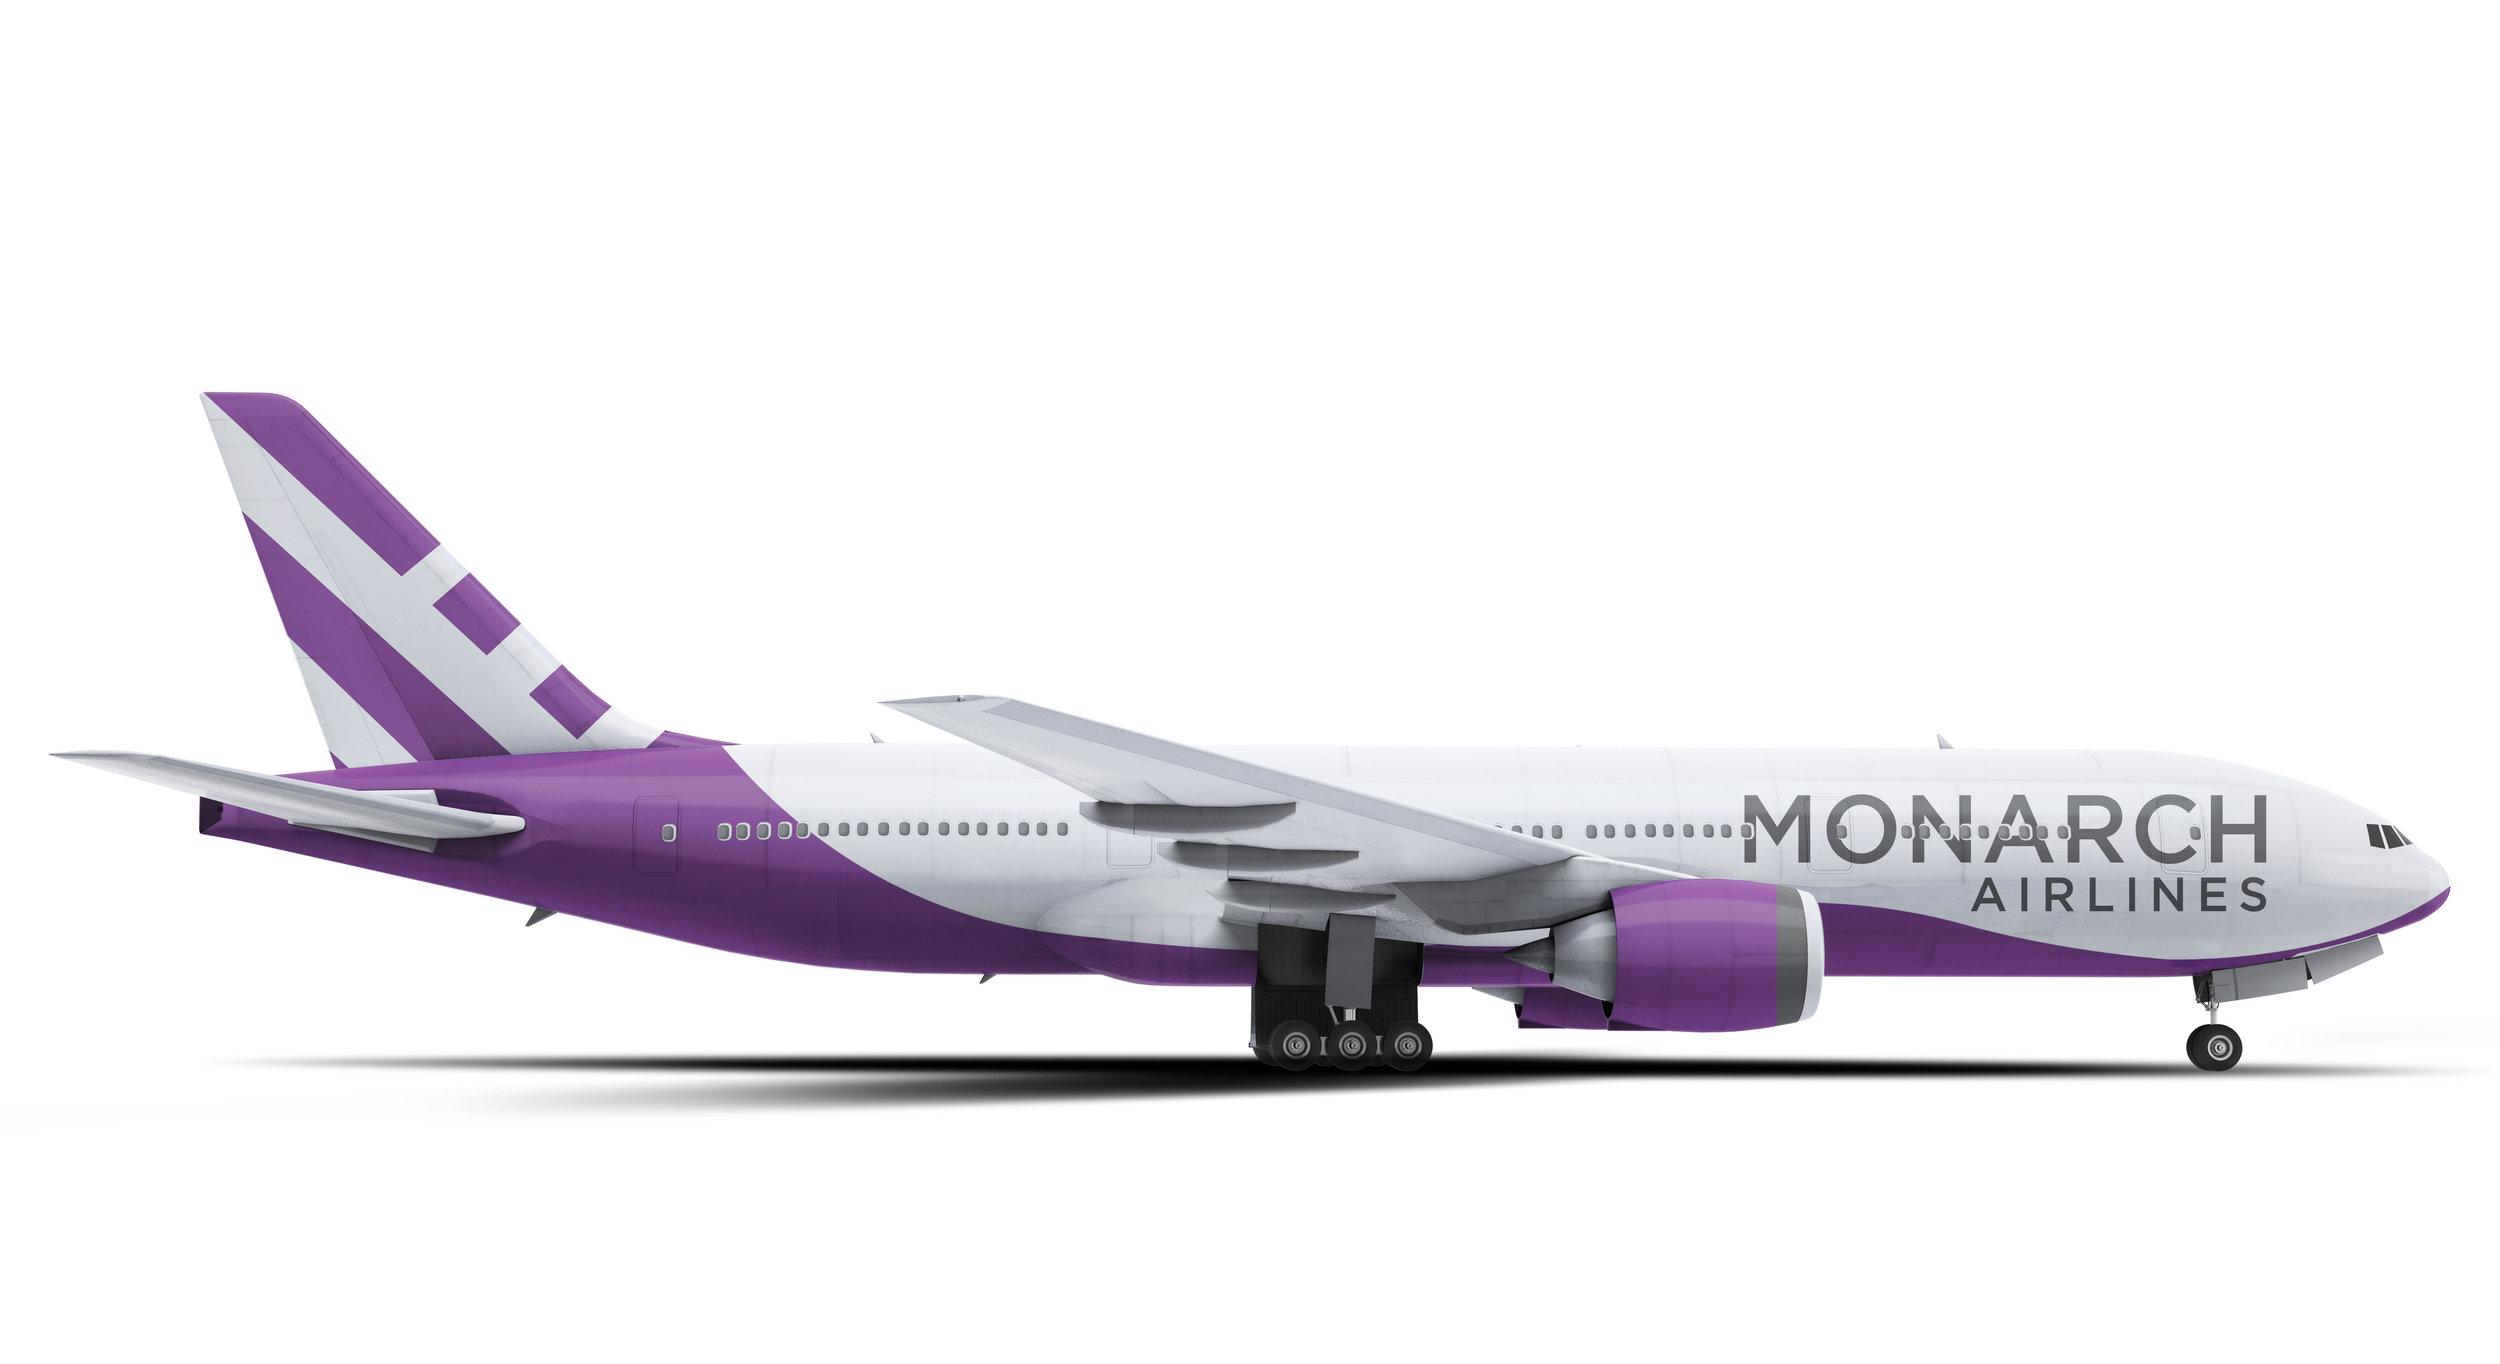 airplanemockup.jpg